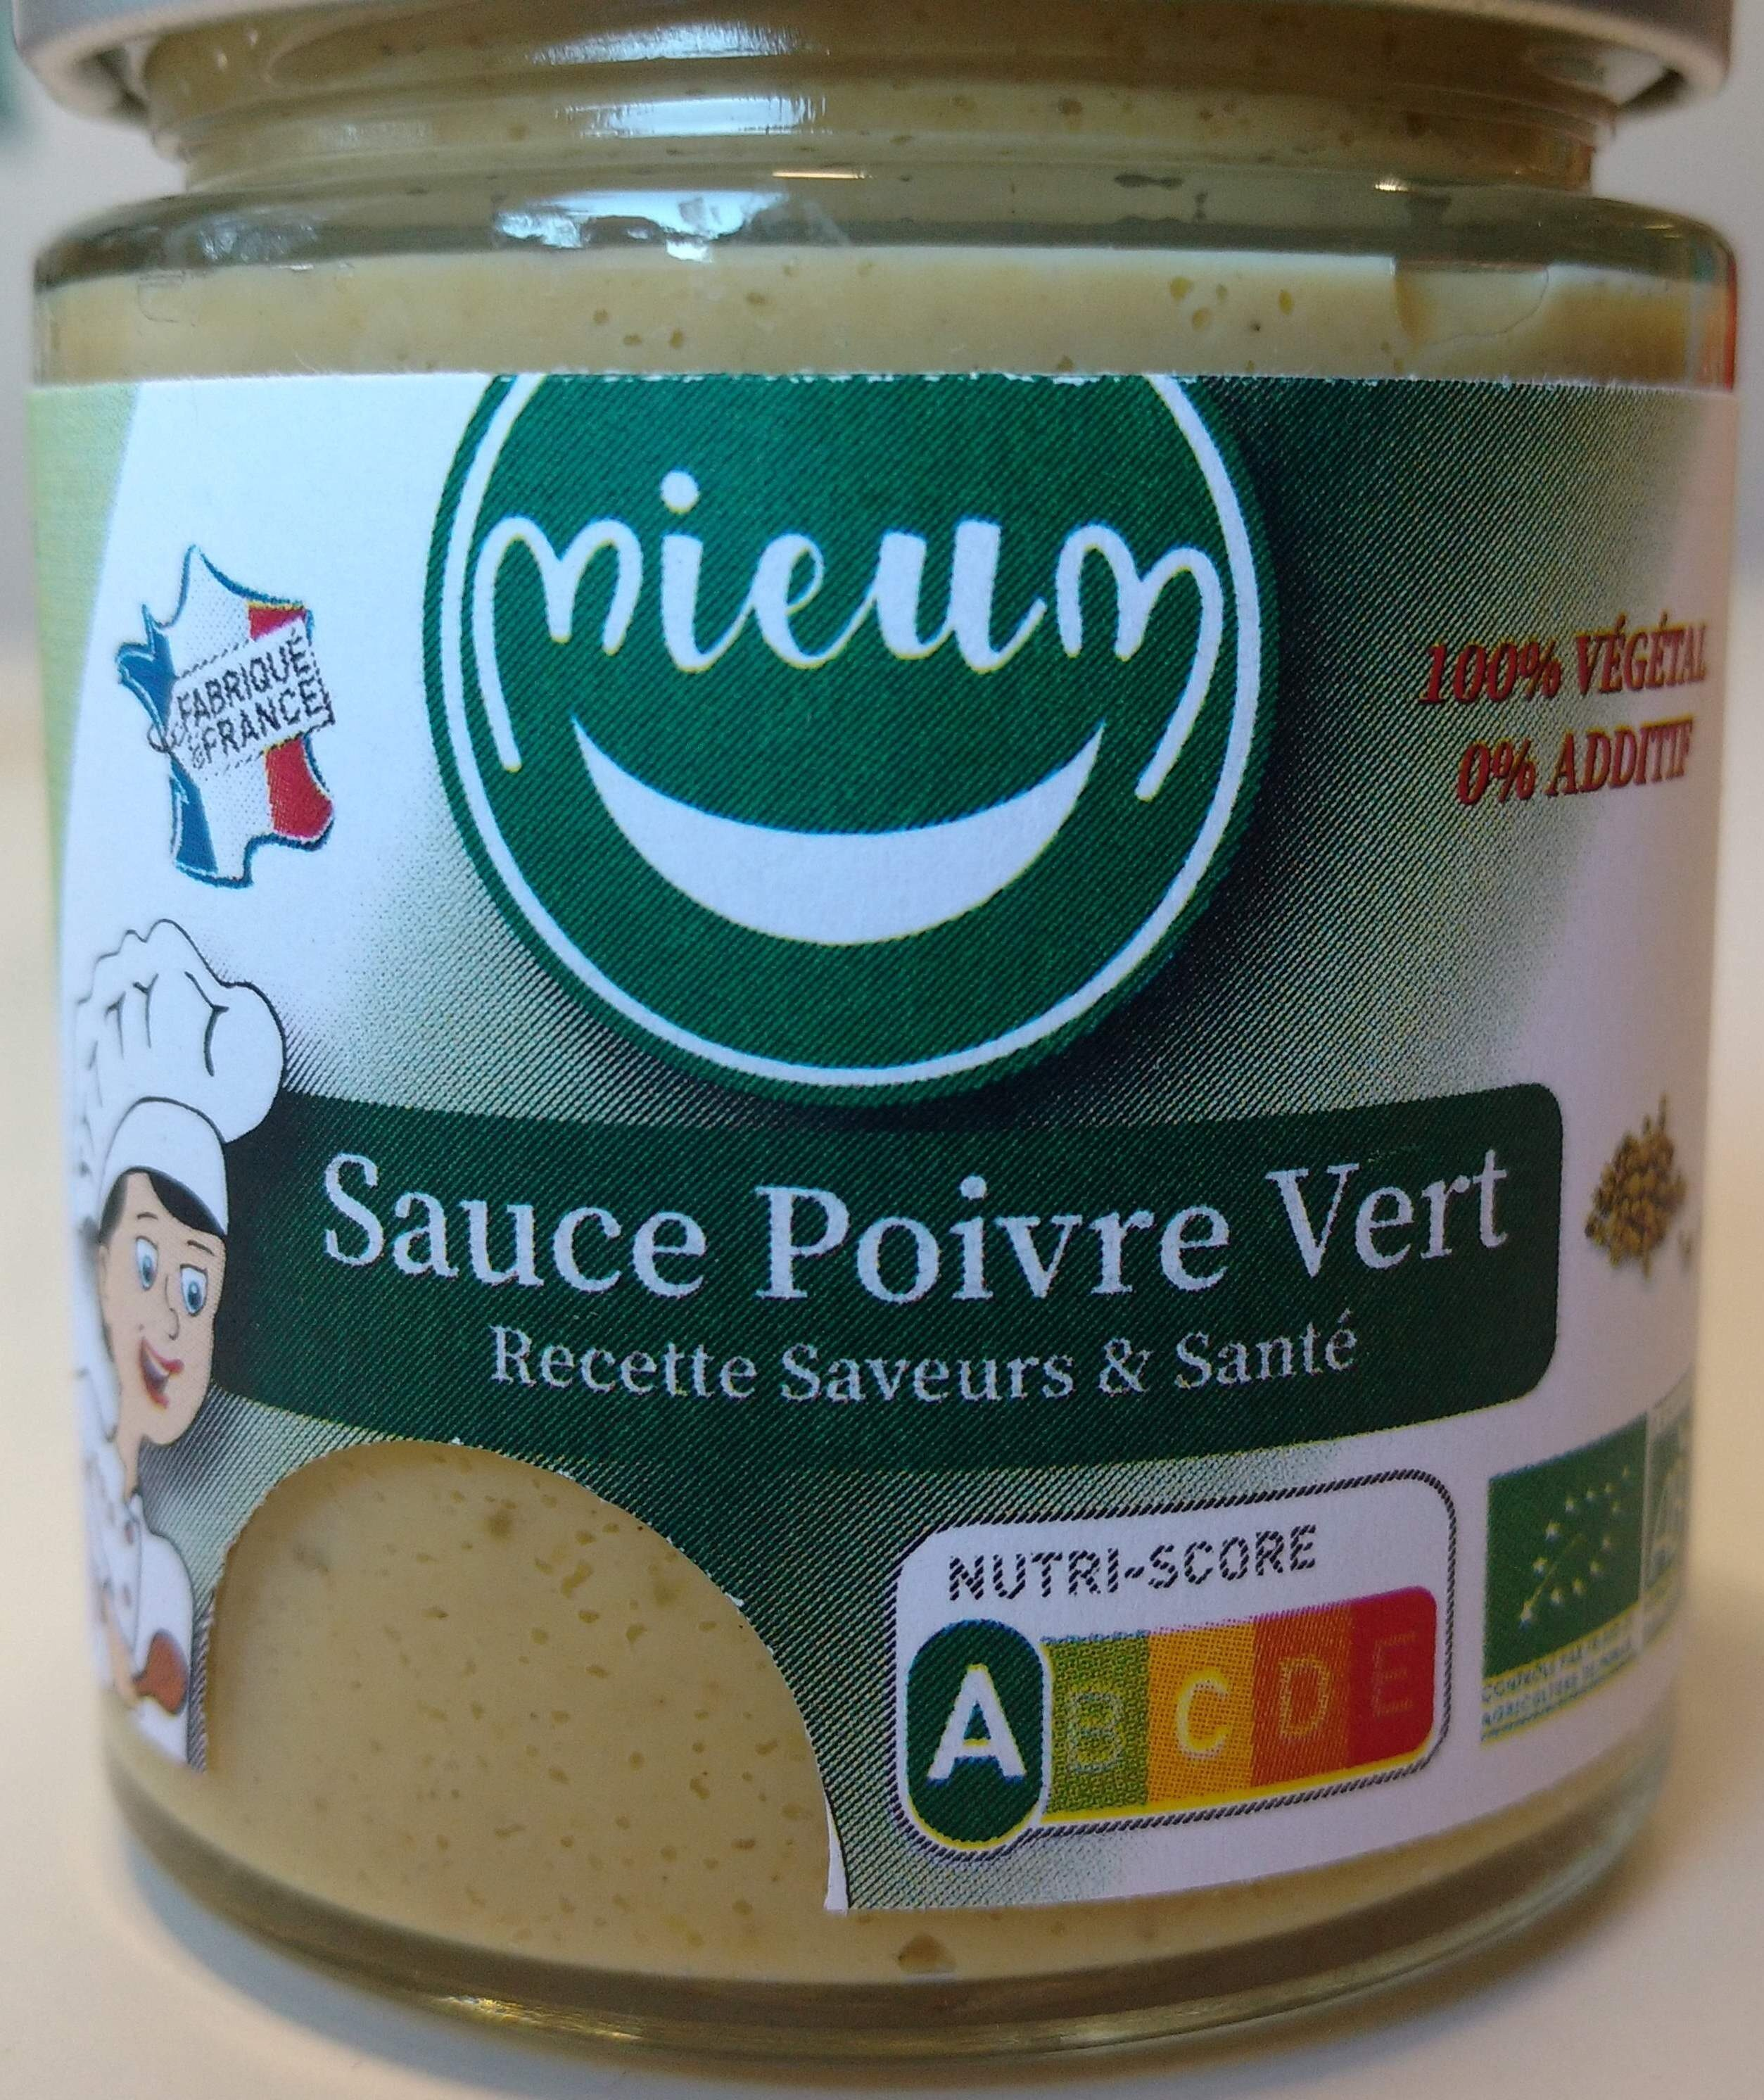 Sauce Poivre Vert - Product - fr